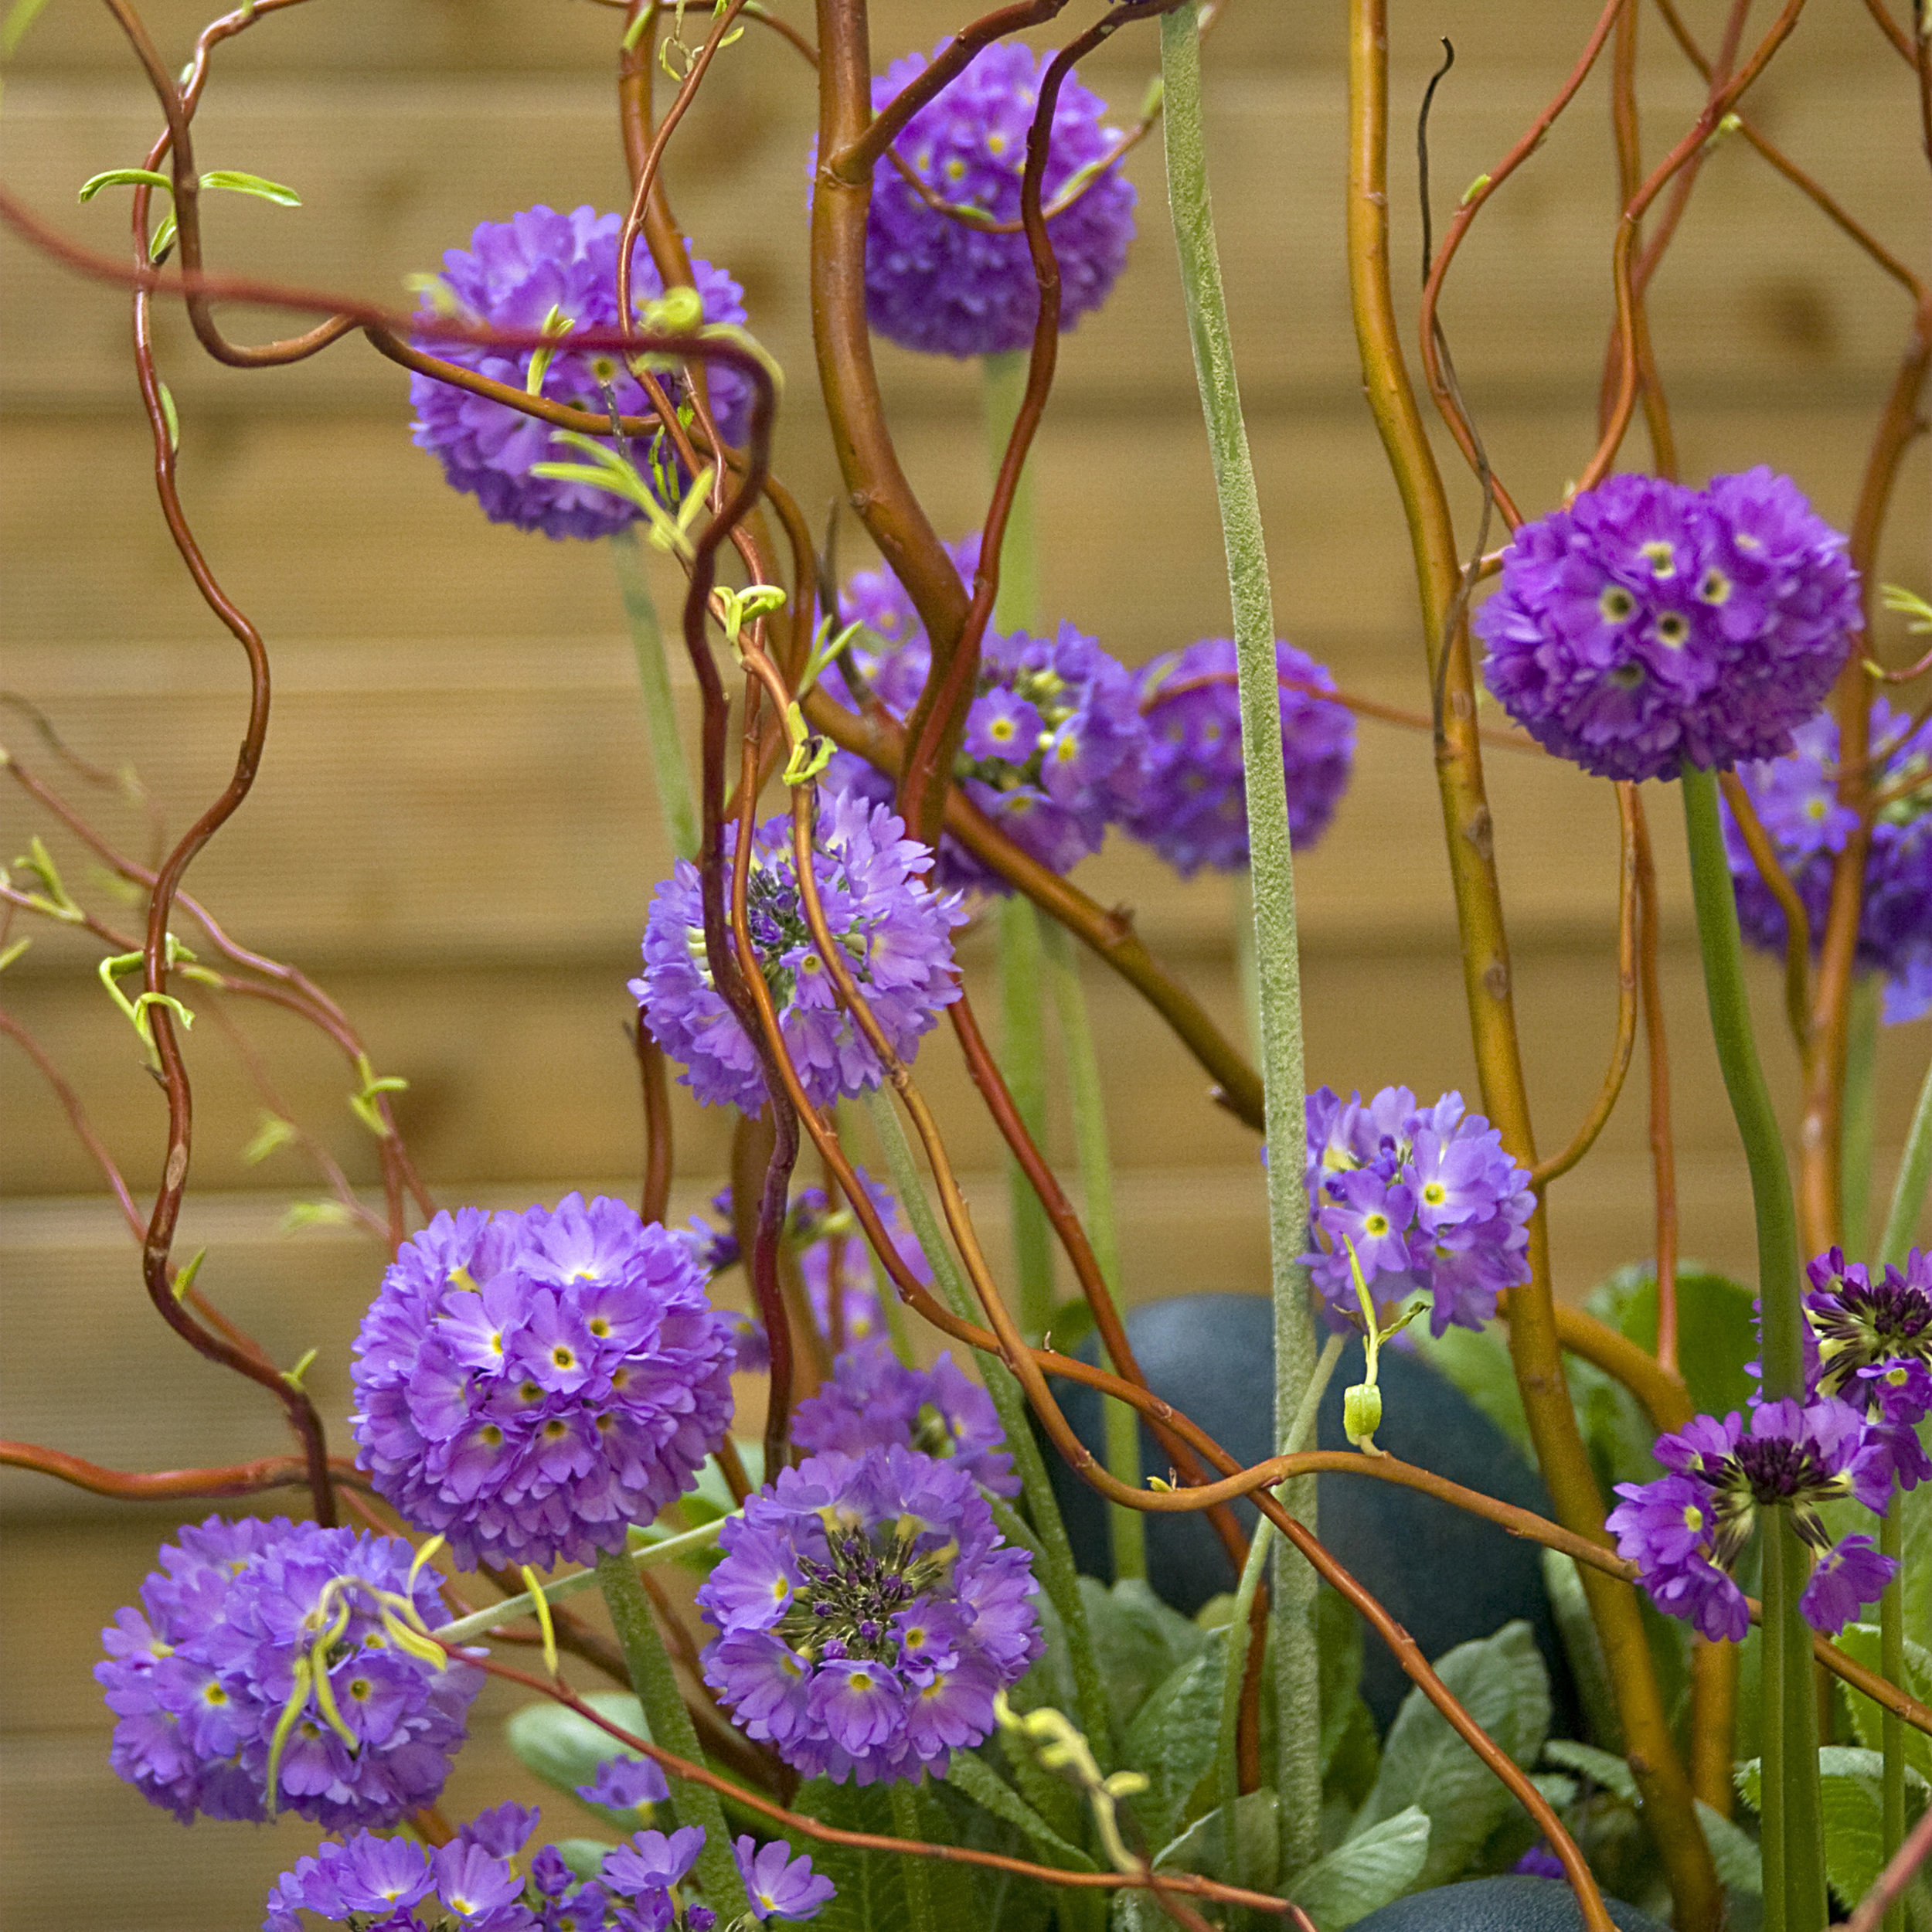 HR_Seed_Primula_Corolla__Corolla__Blue_70001241_3.jpg